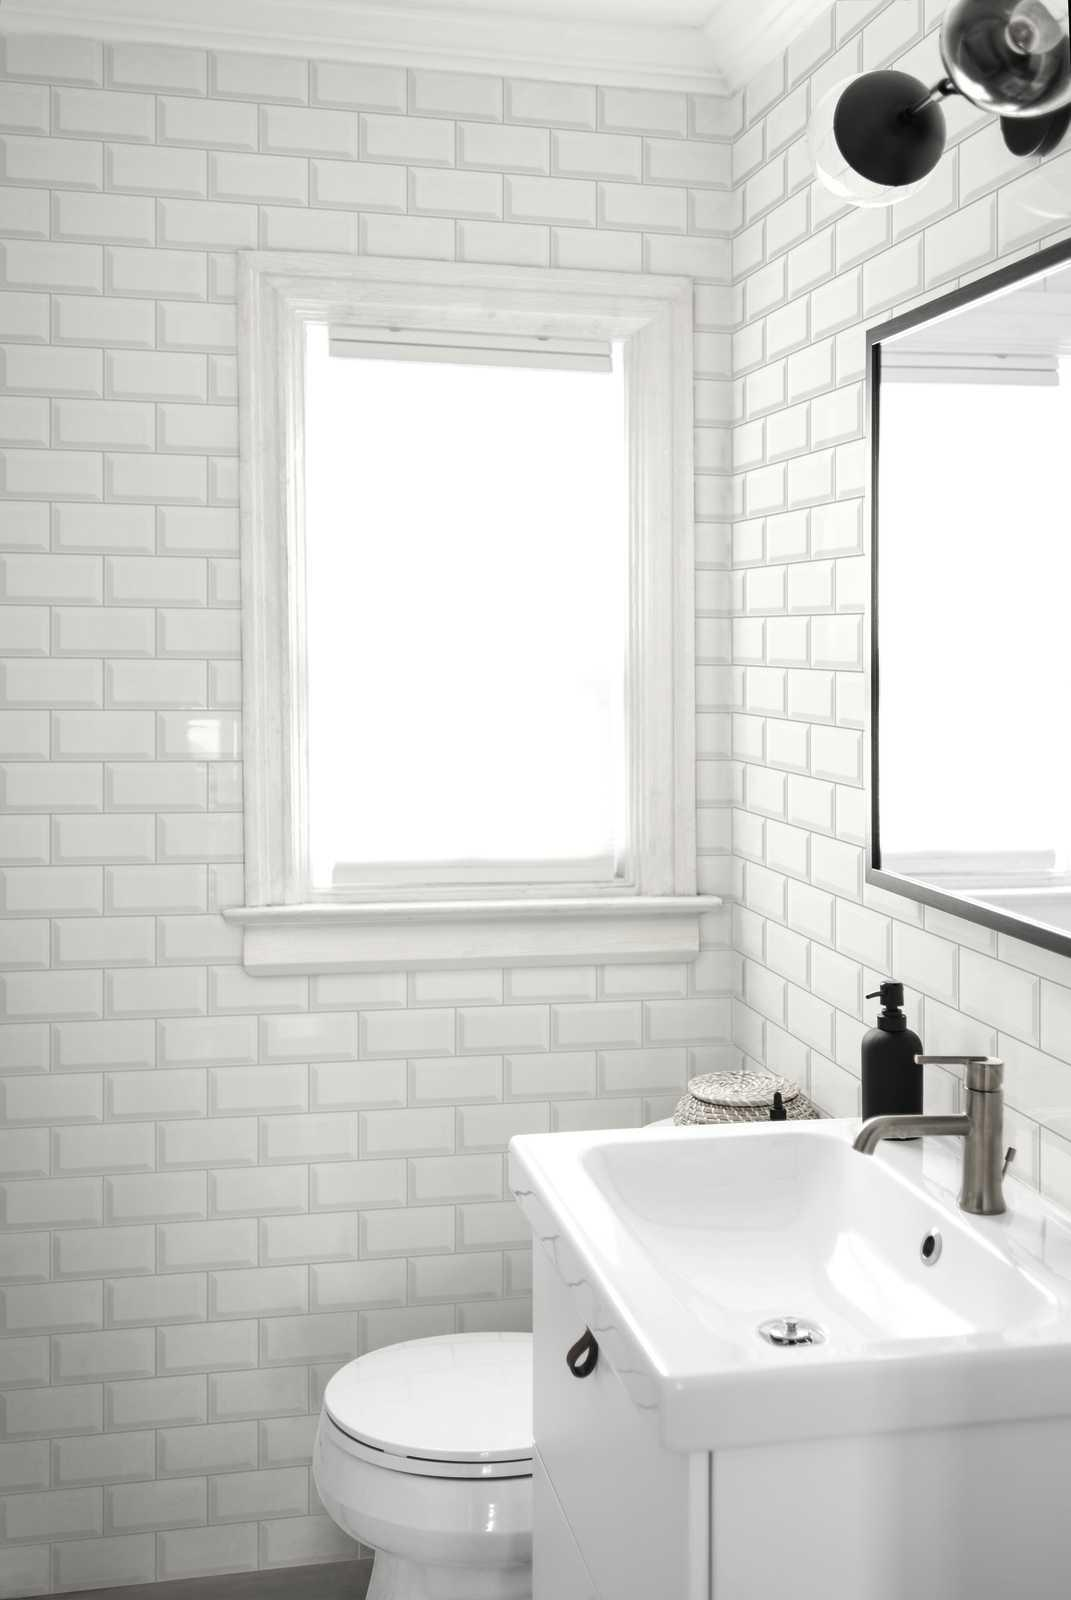 Magasin Salle De Bain Uccle ~ carrelage salle de bain vague carrelage salle de bain canaline de